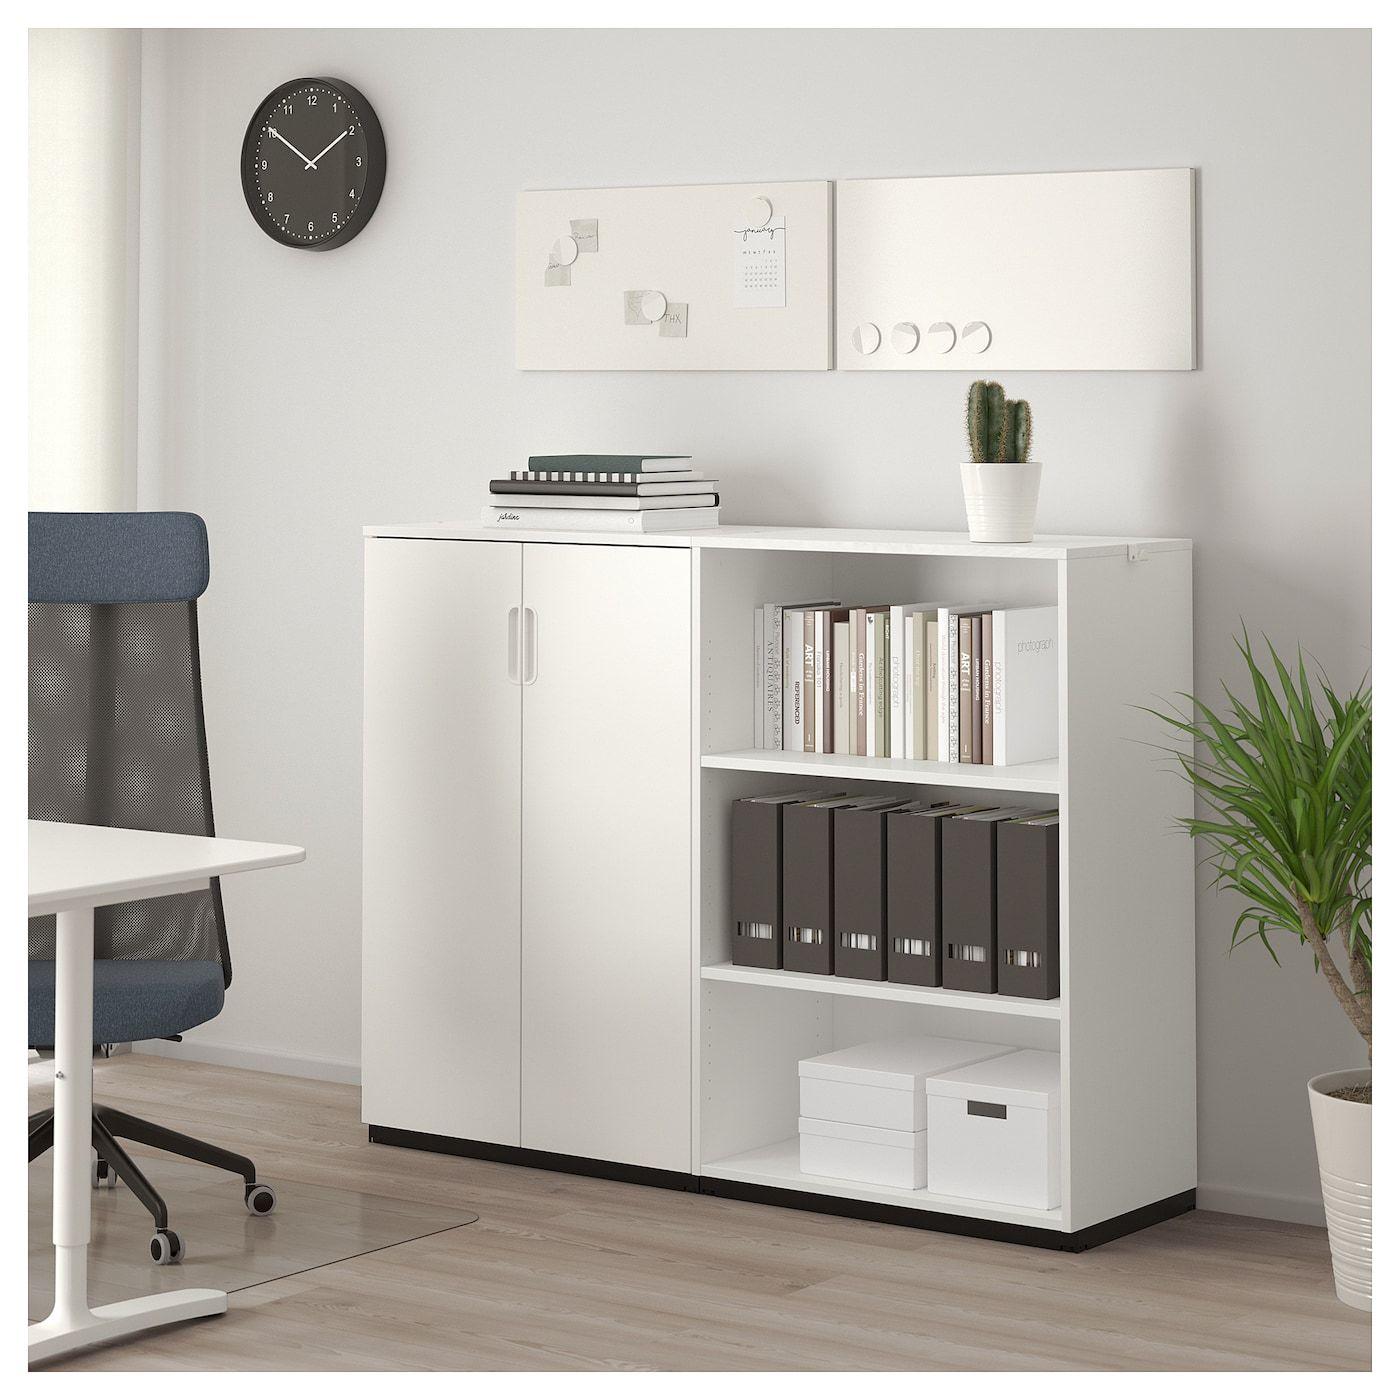 IKEA GALANT Storage combination white in 2020 Ikea